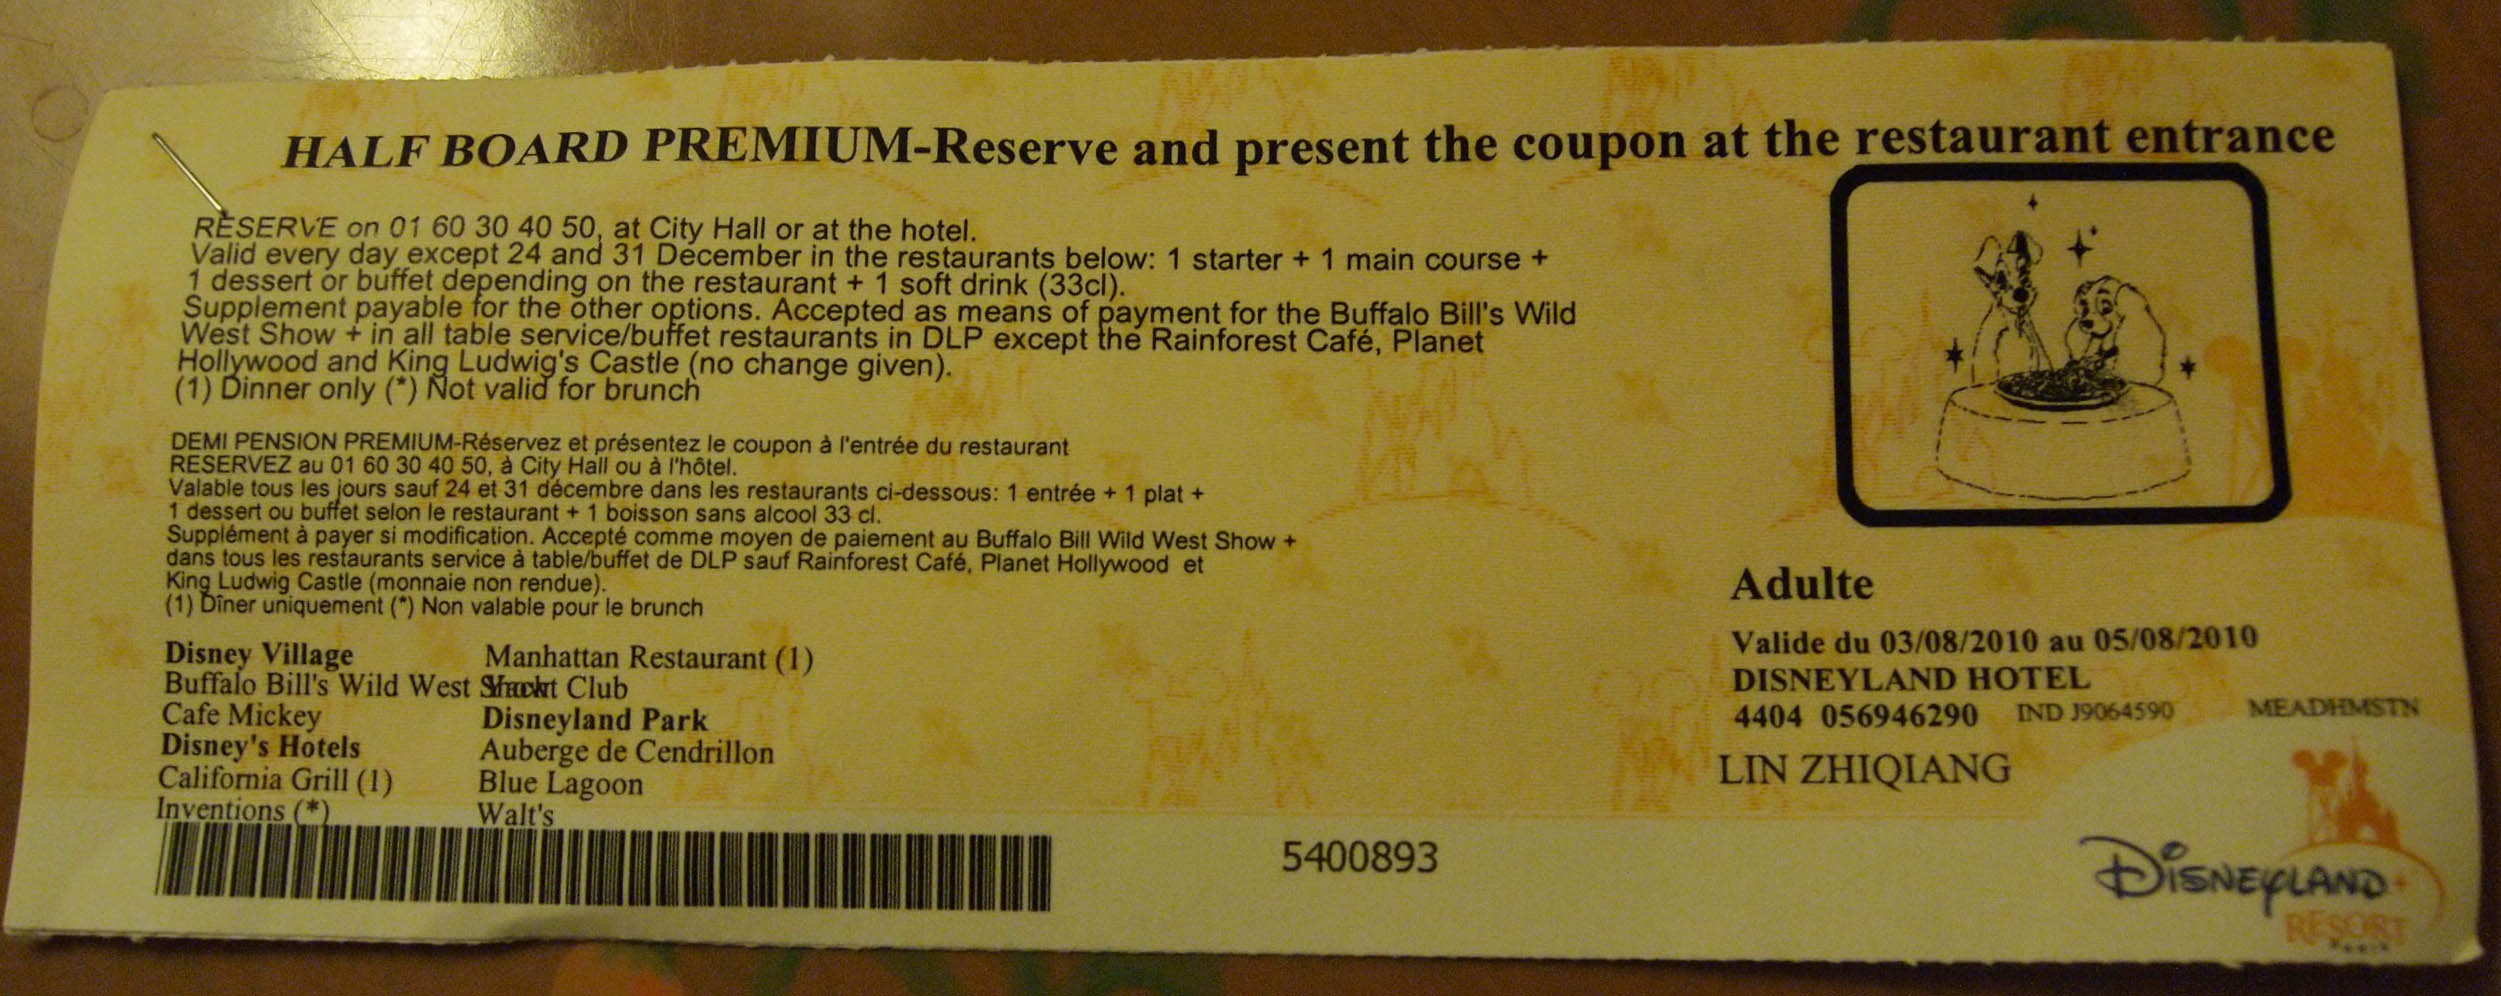 Disneyland-Paris-Half-Board-Premium-Pass-Voucher